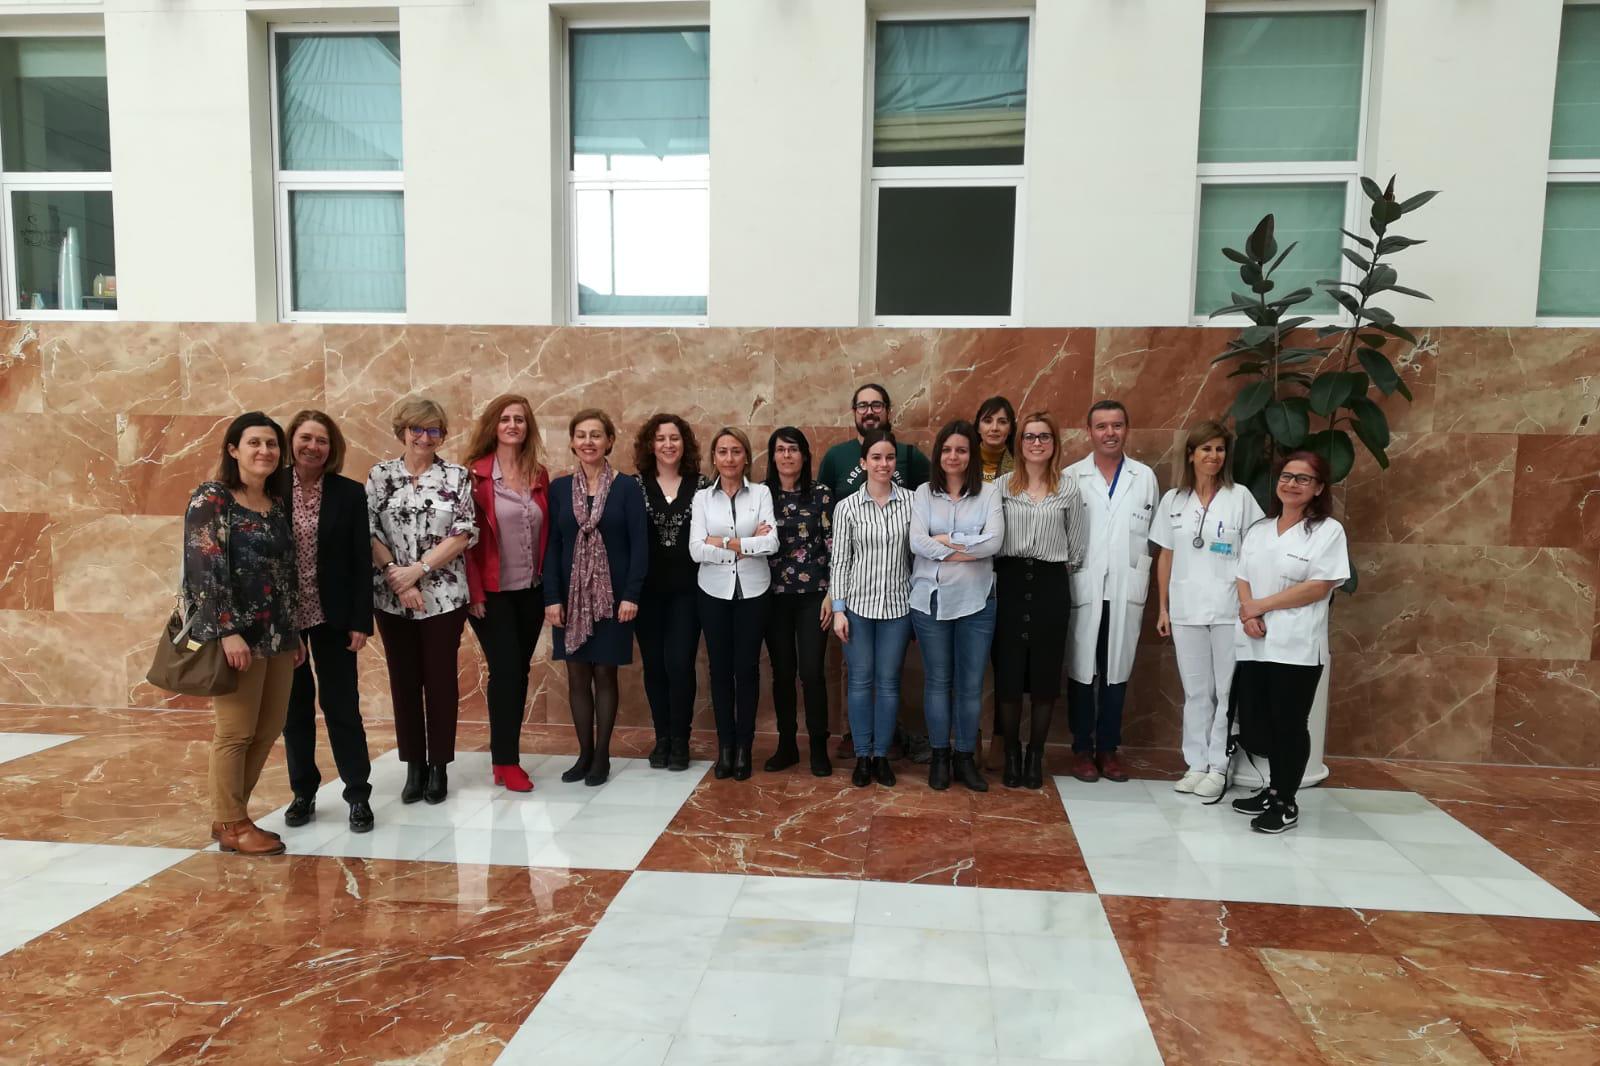 Alicante acoge hoy una jornada sobre enfermedades reumáticas inflamatorias crónicas inmunomediadas